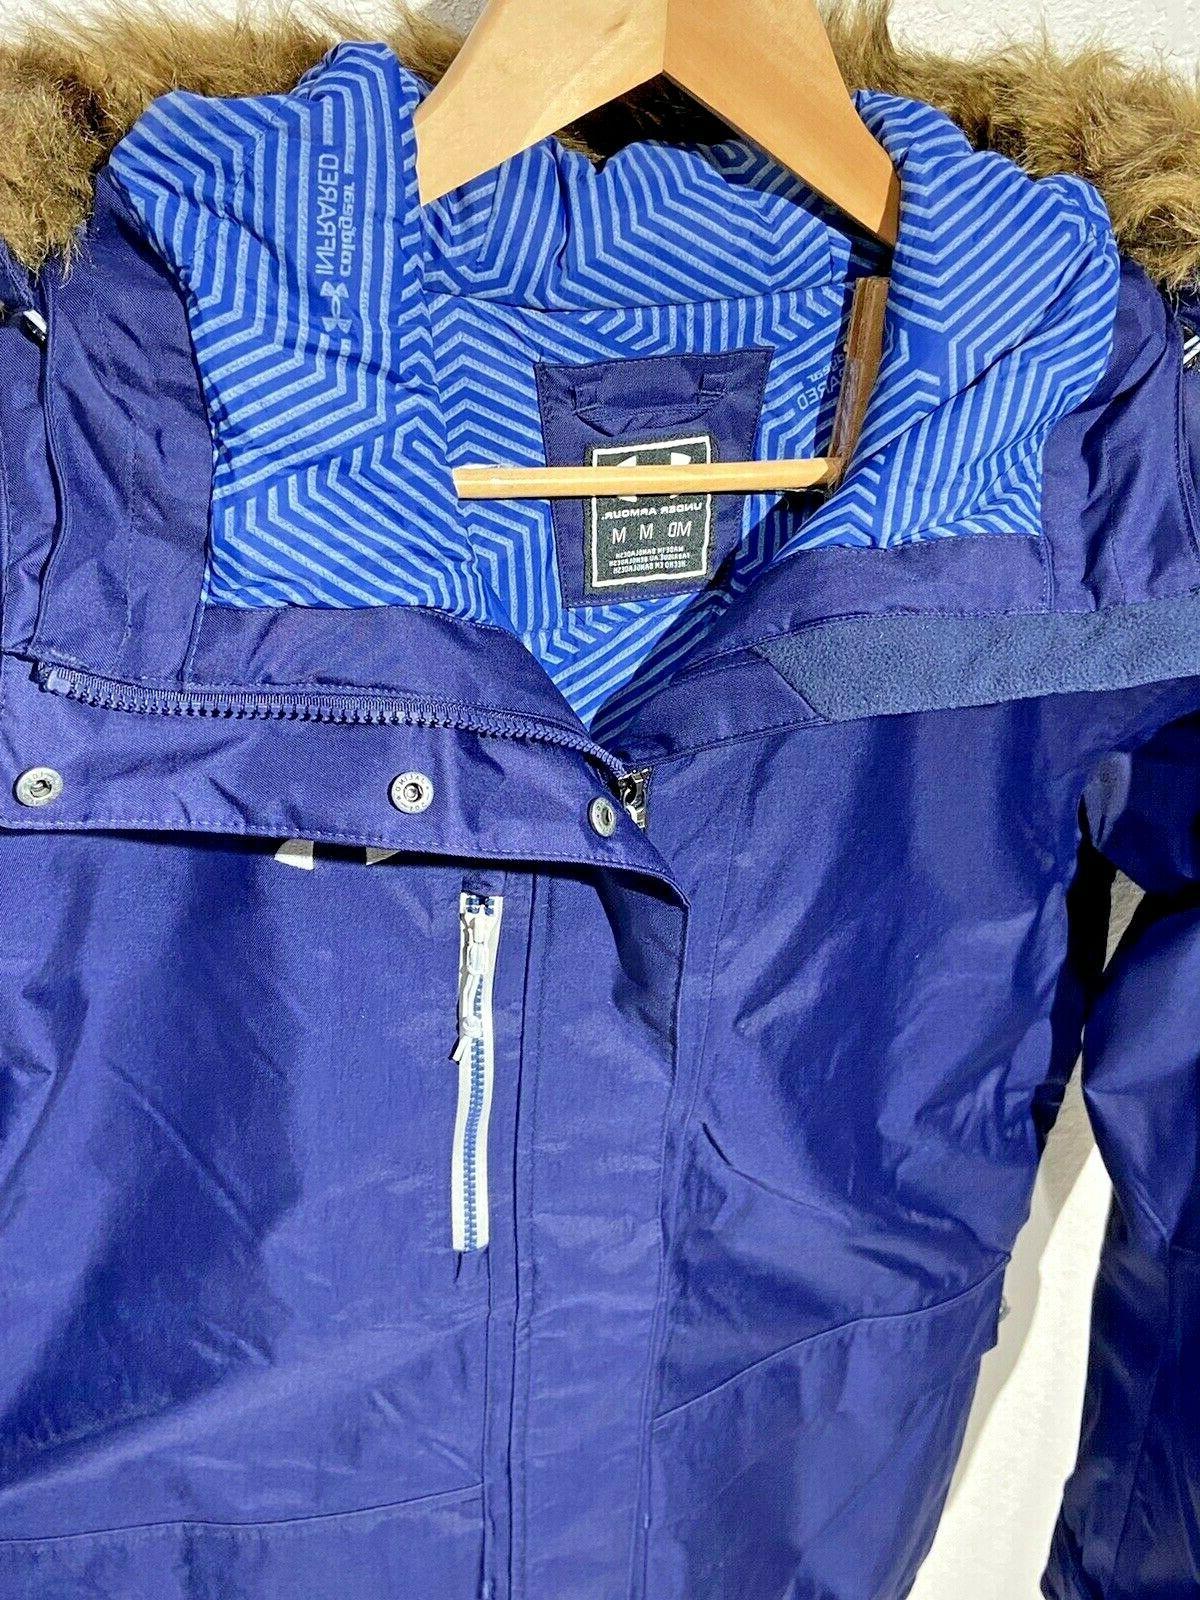 Under Armour Gear Voltage Jacket Size New 1280828-410